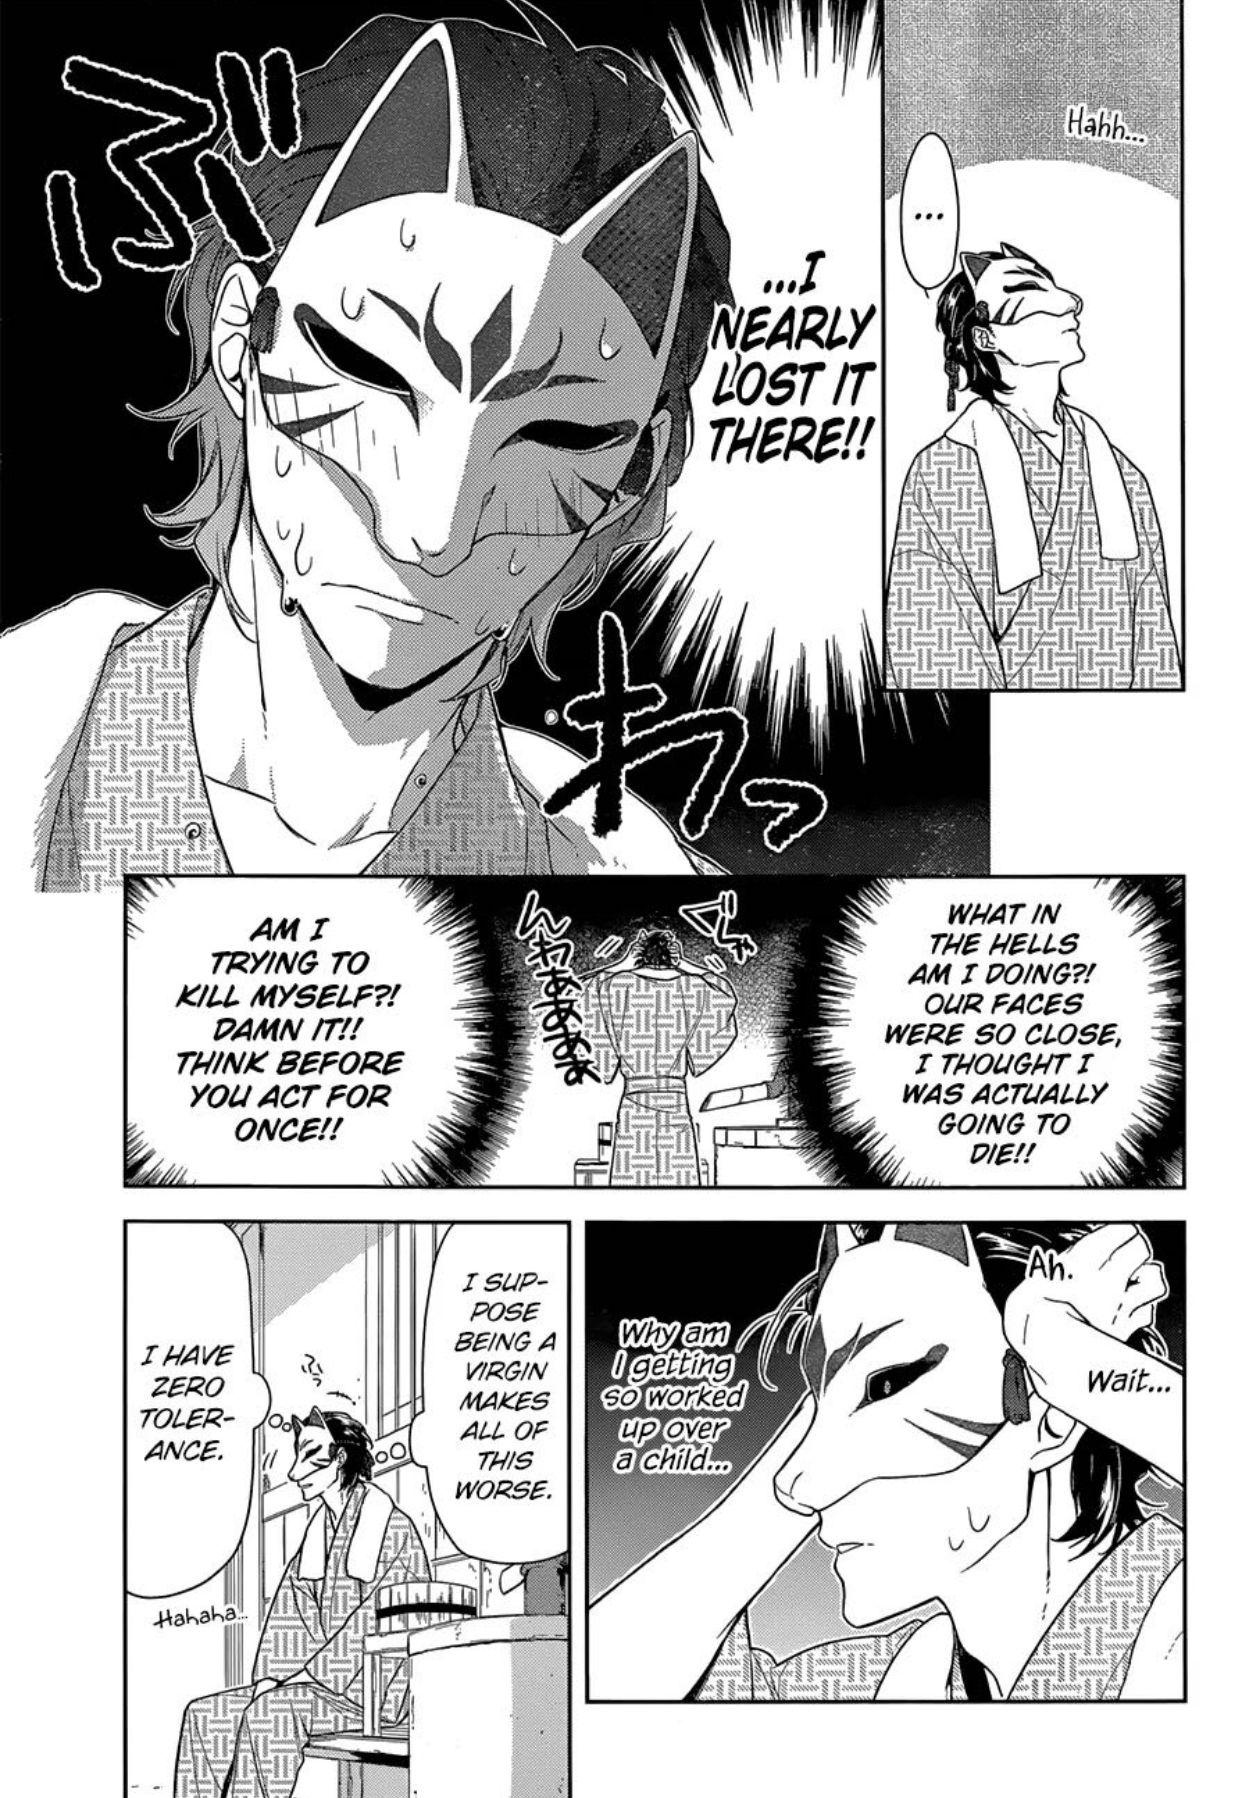 Pin by Animemangaluver on Nenene Manga Manga reader